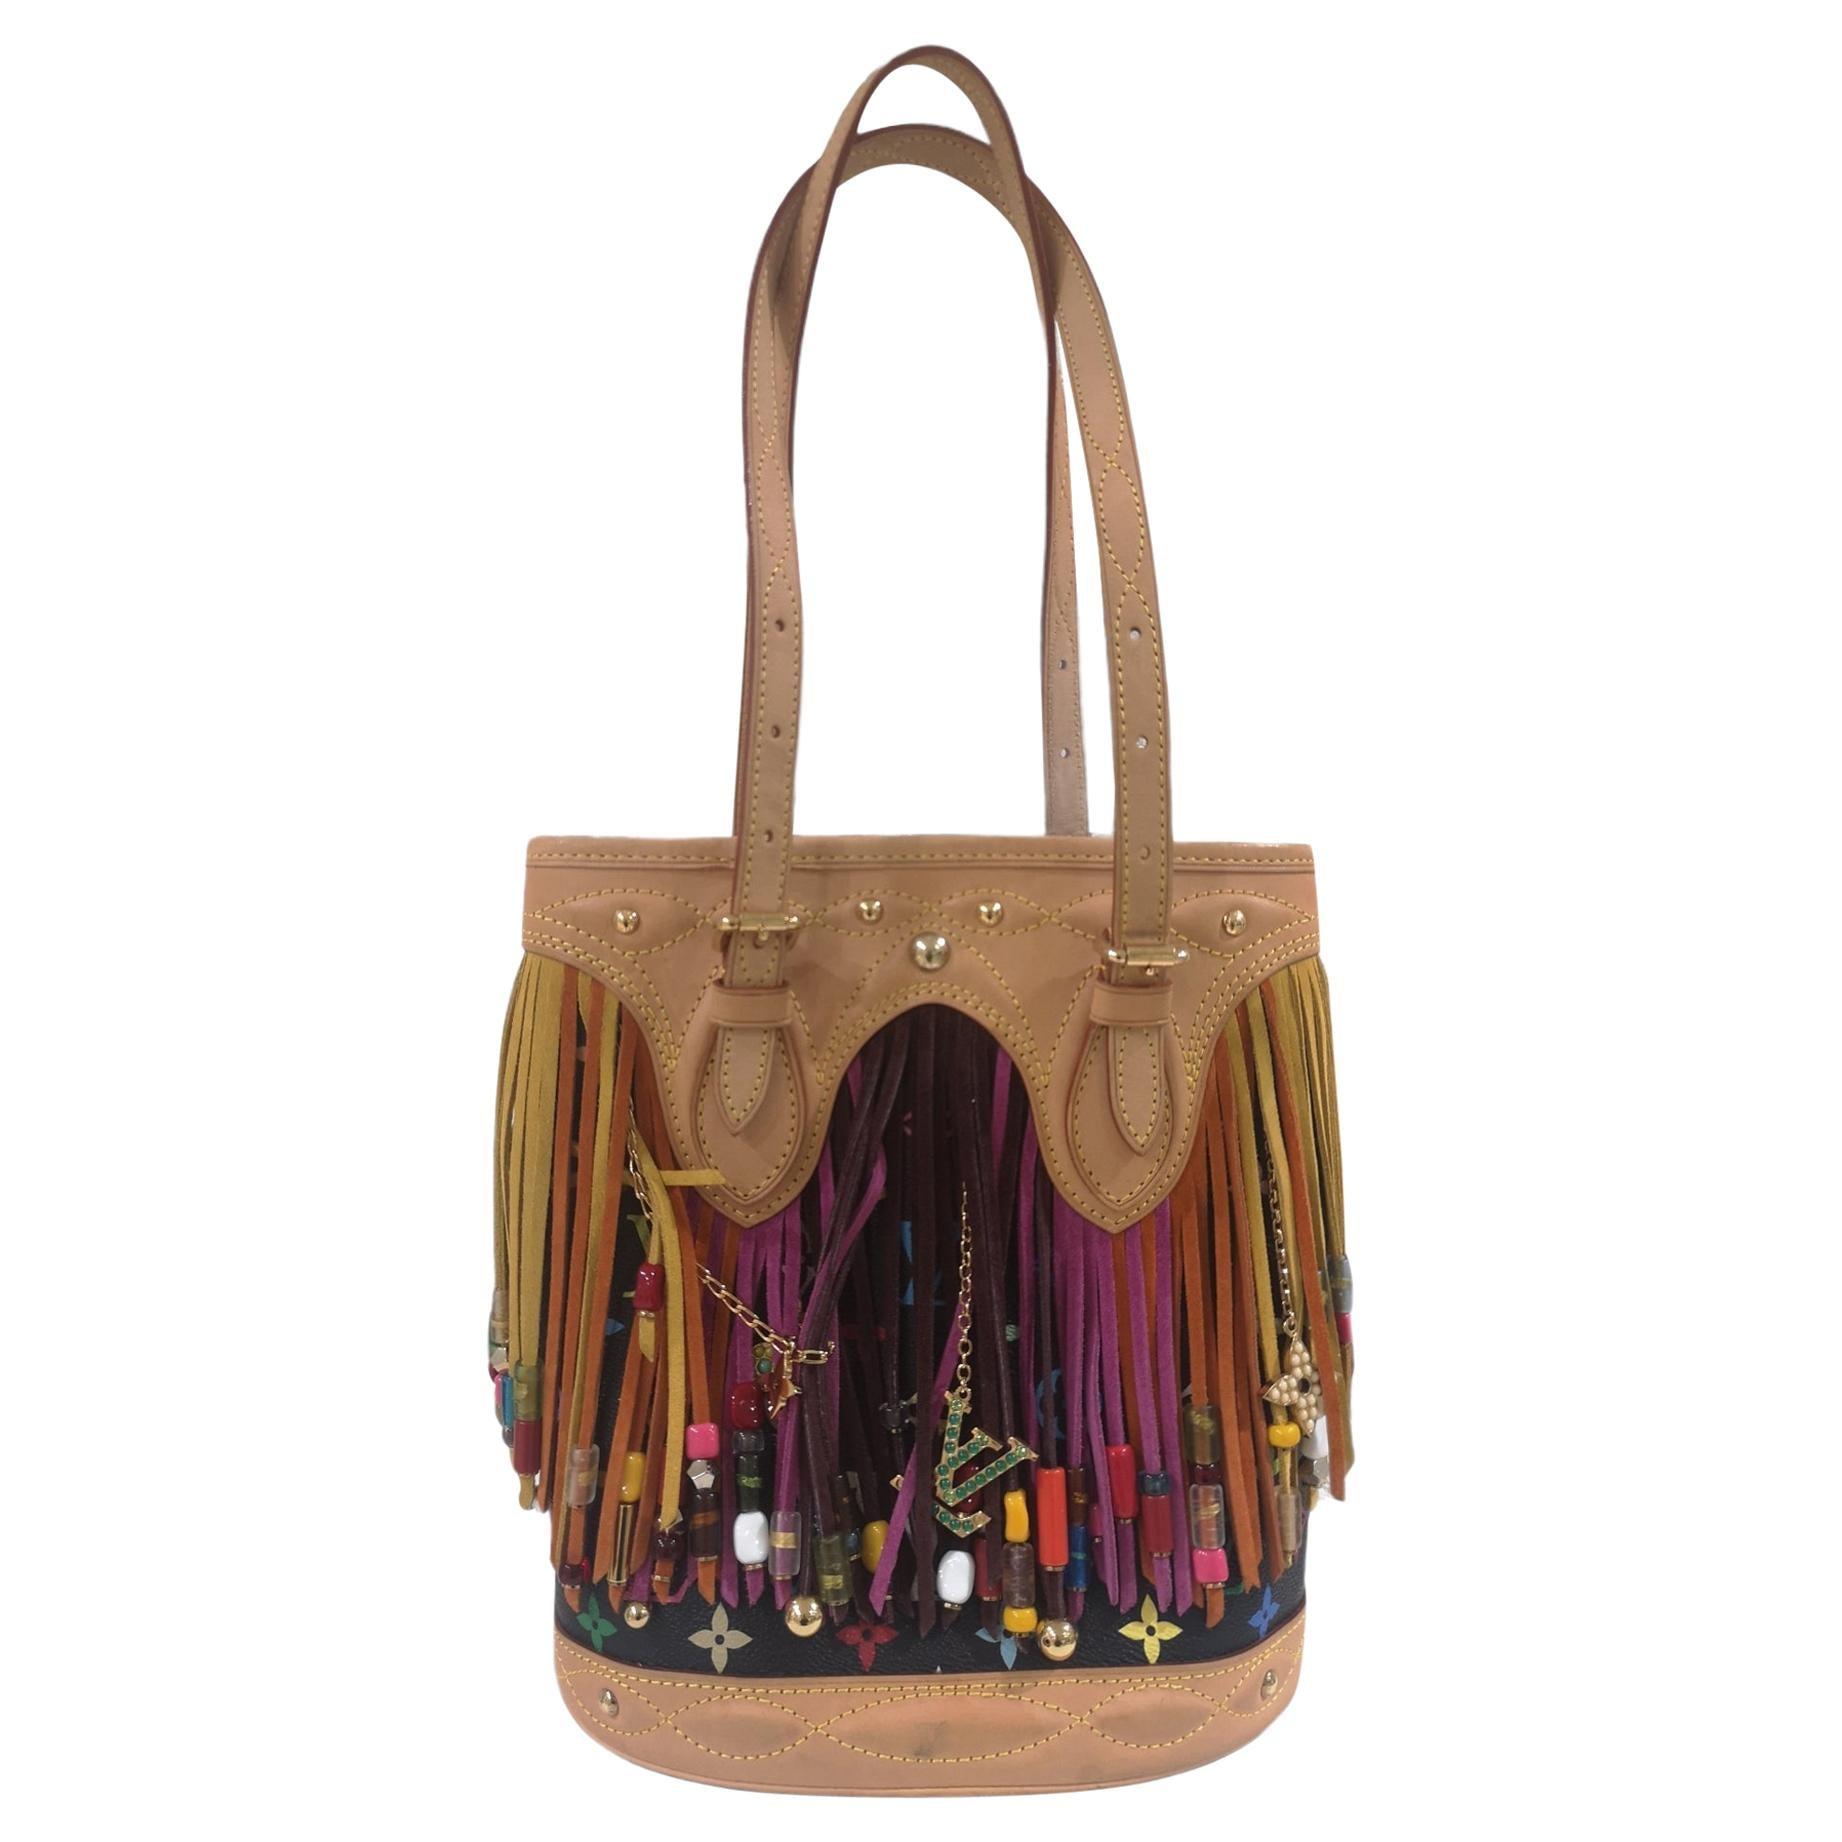 Louis Vuitton Takashi Murakami Black multicoloured fringes bucket bag pochette